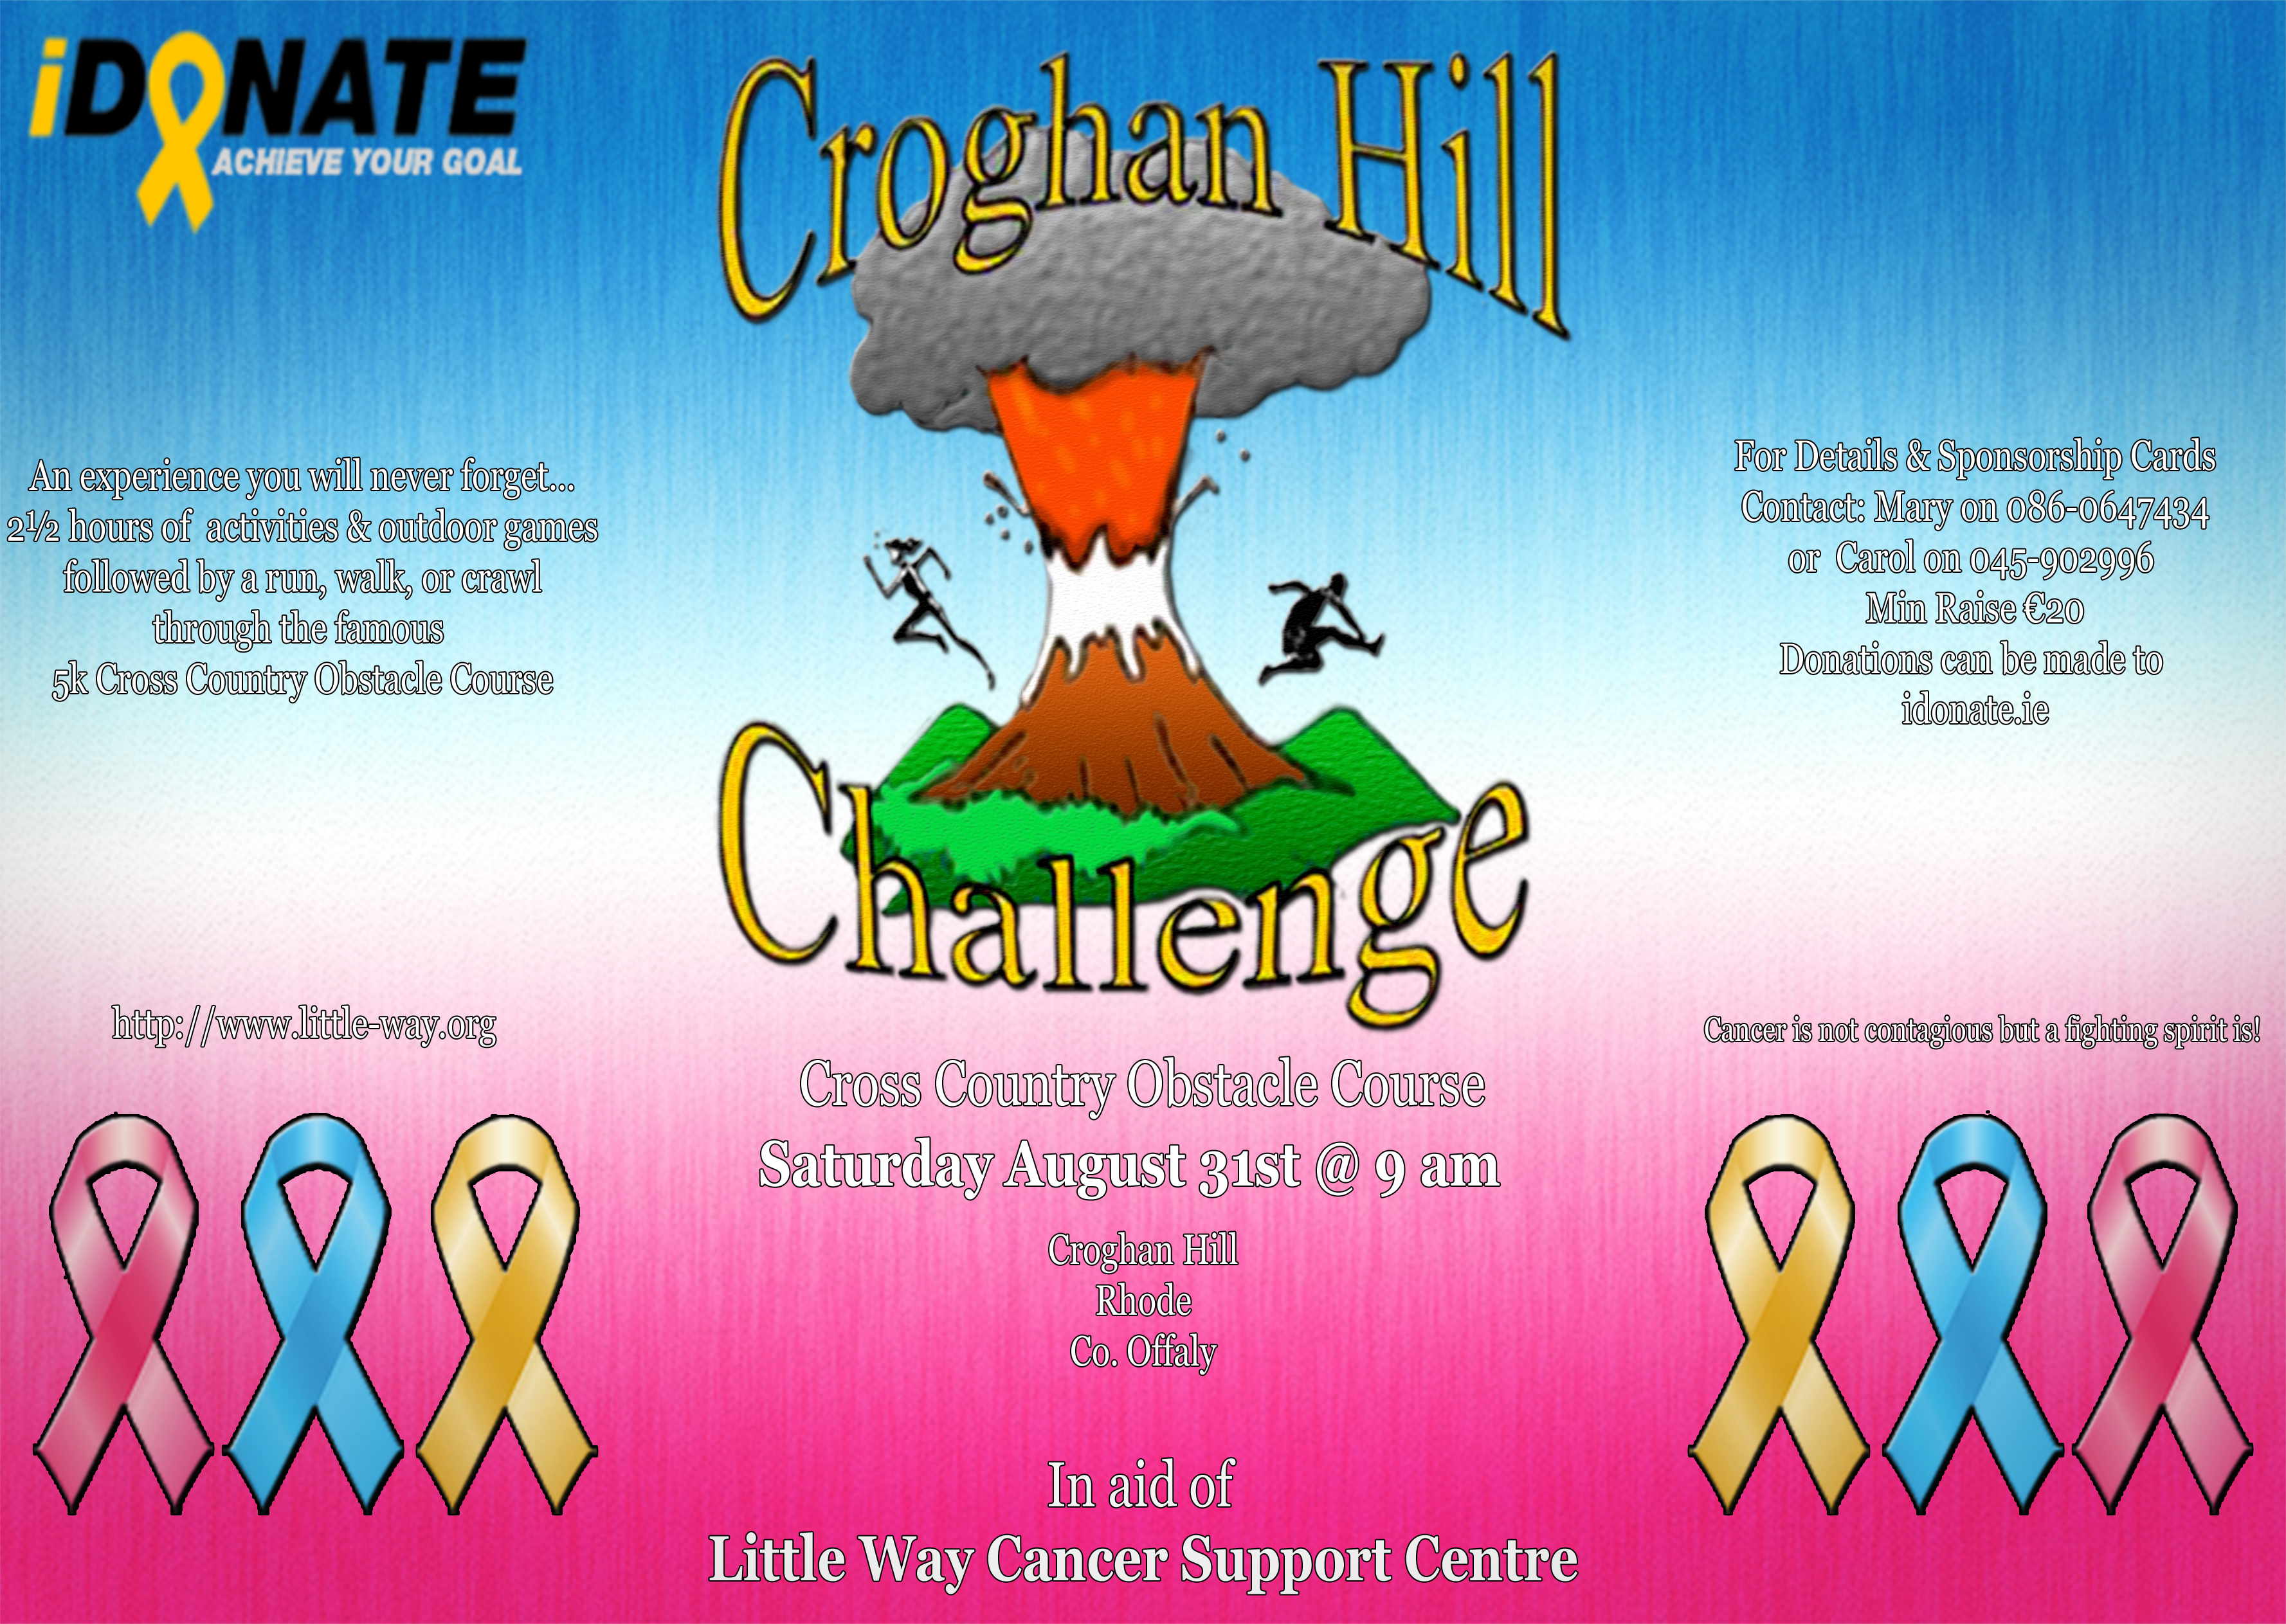 Croghan Hill Challenge 2013